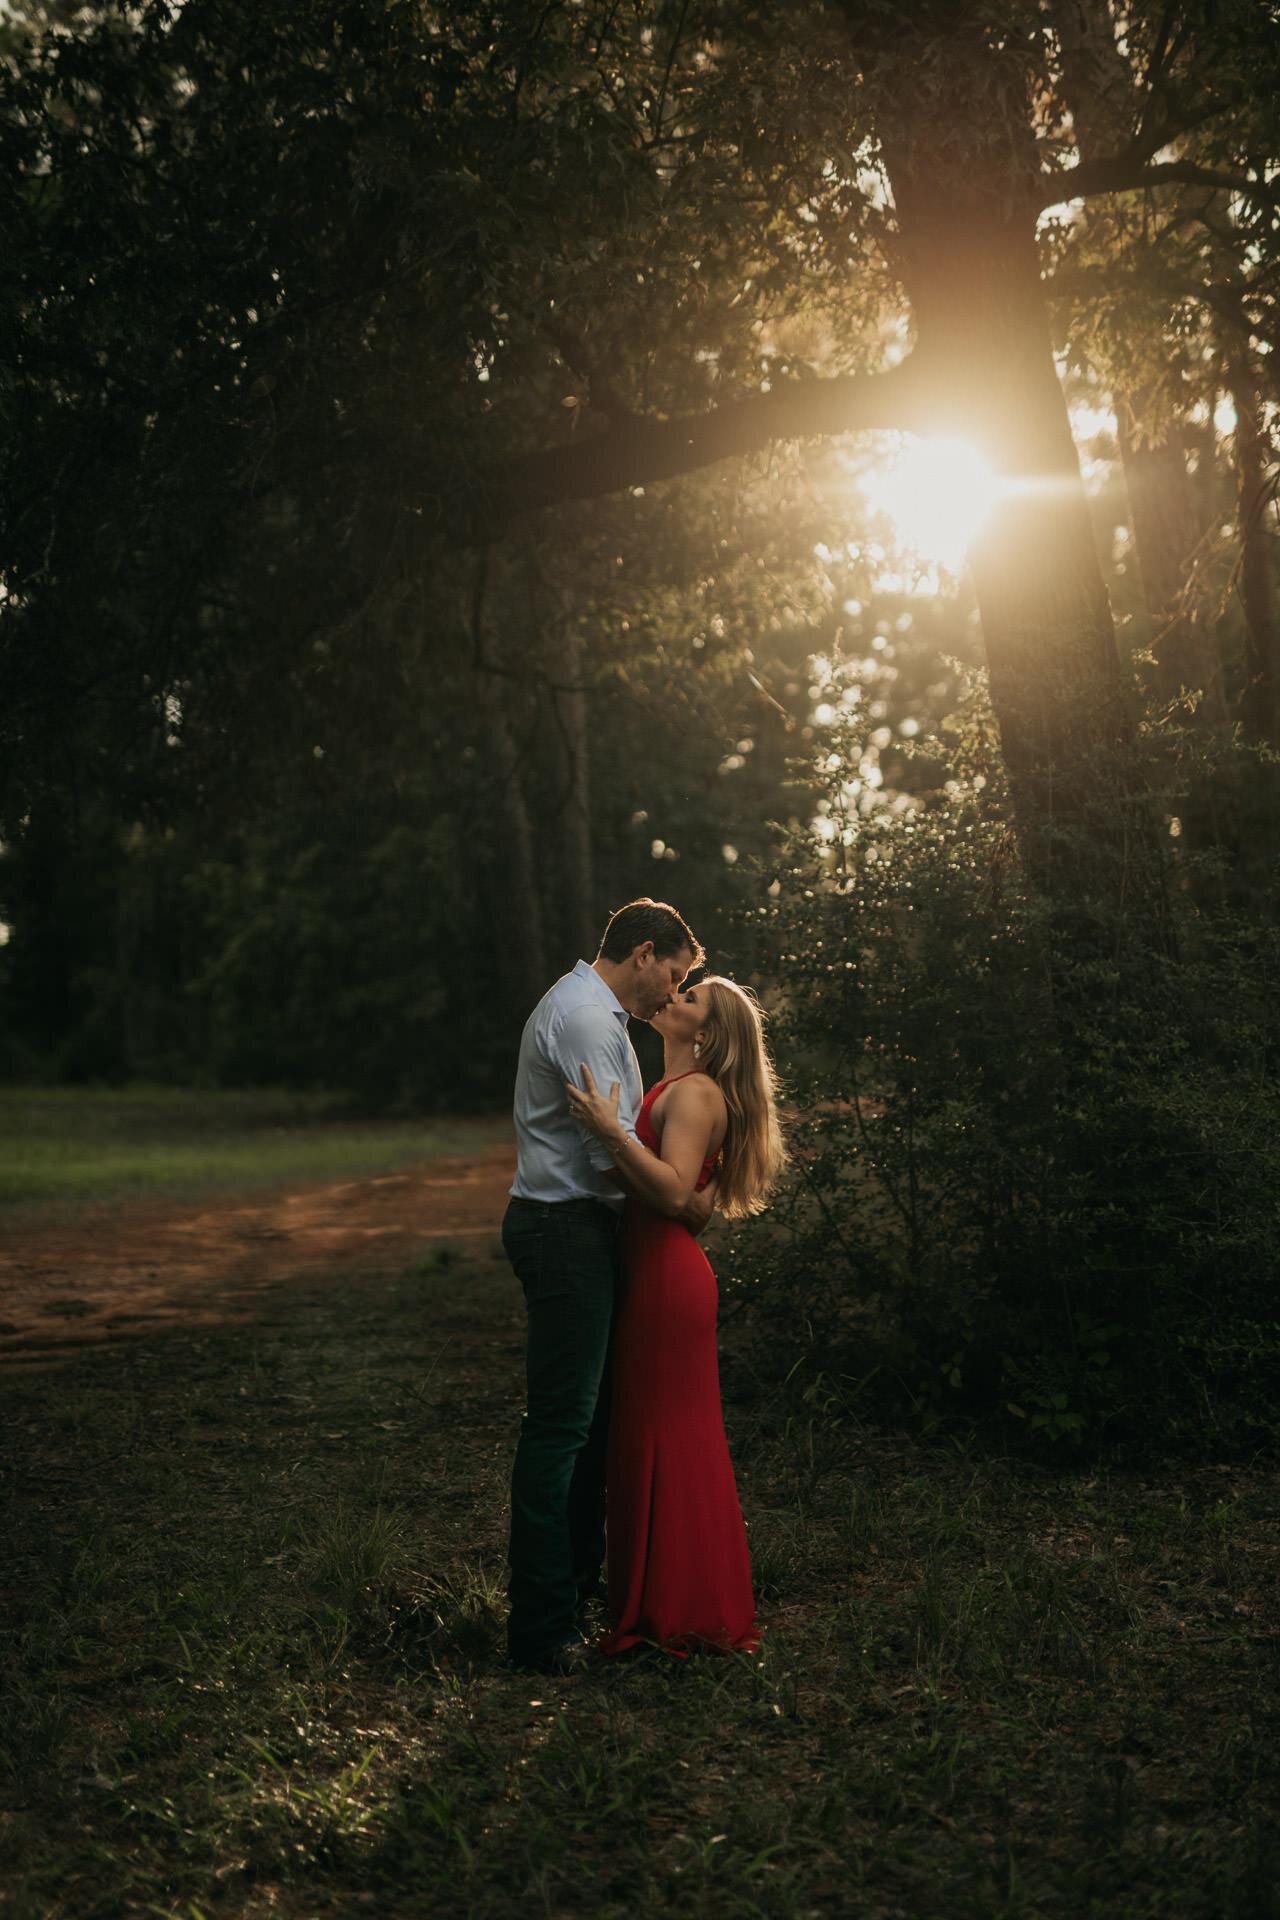 woodlands-conroe-wg-jones-forest-engagement-photography